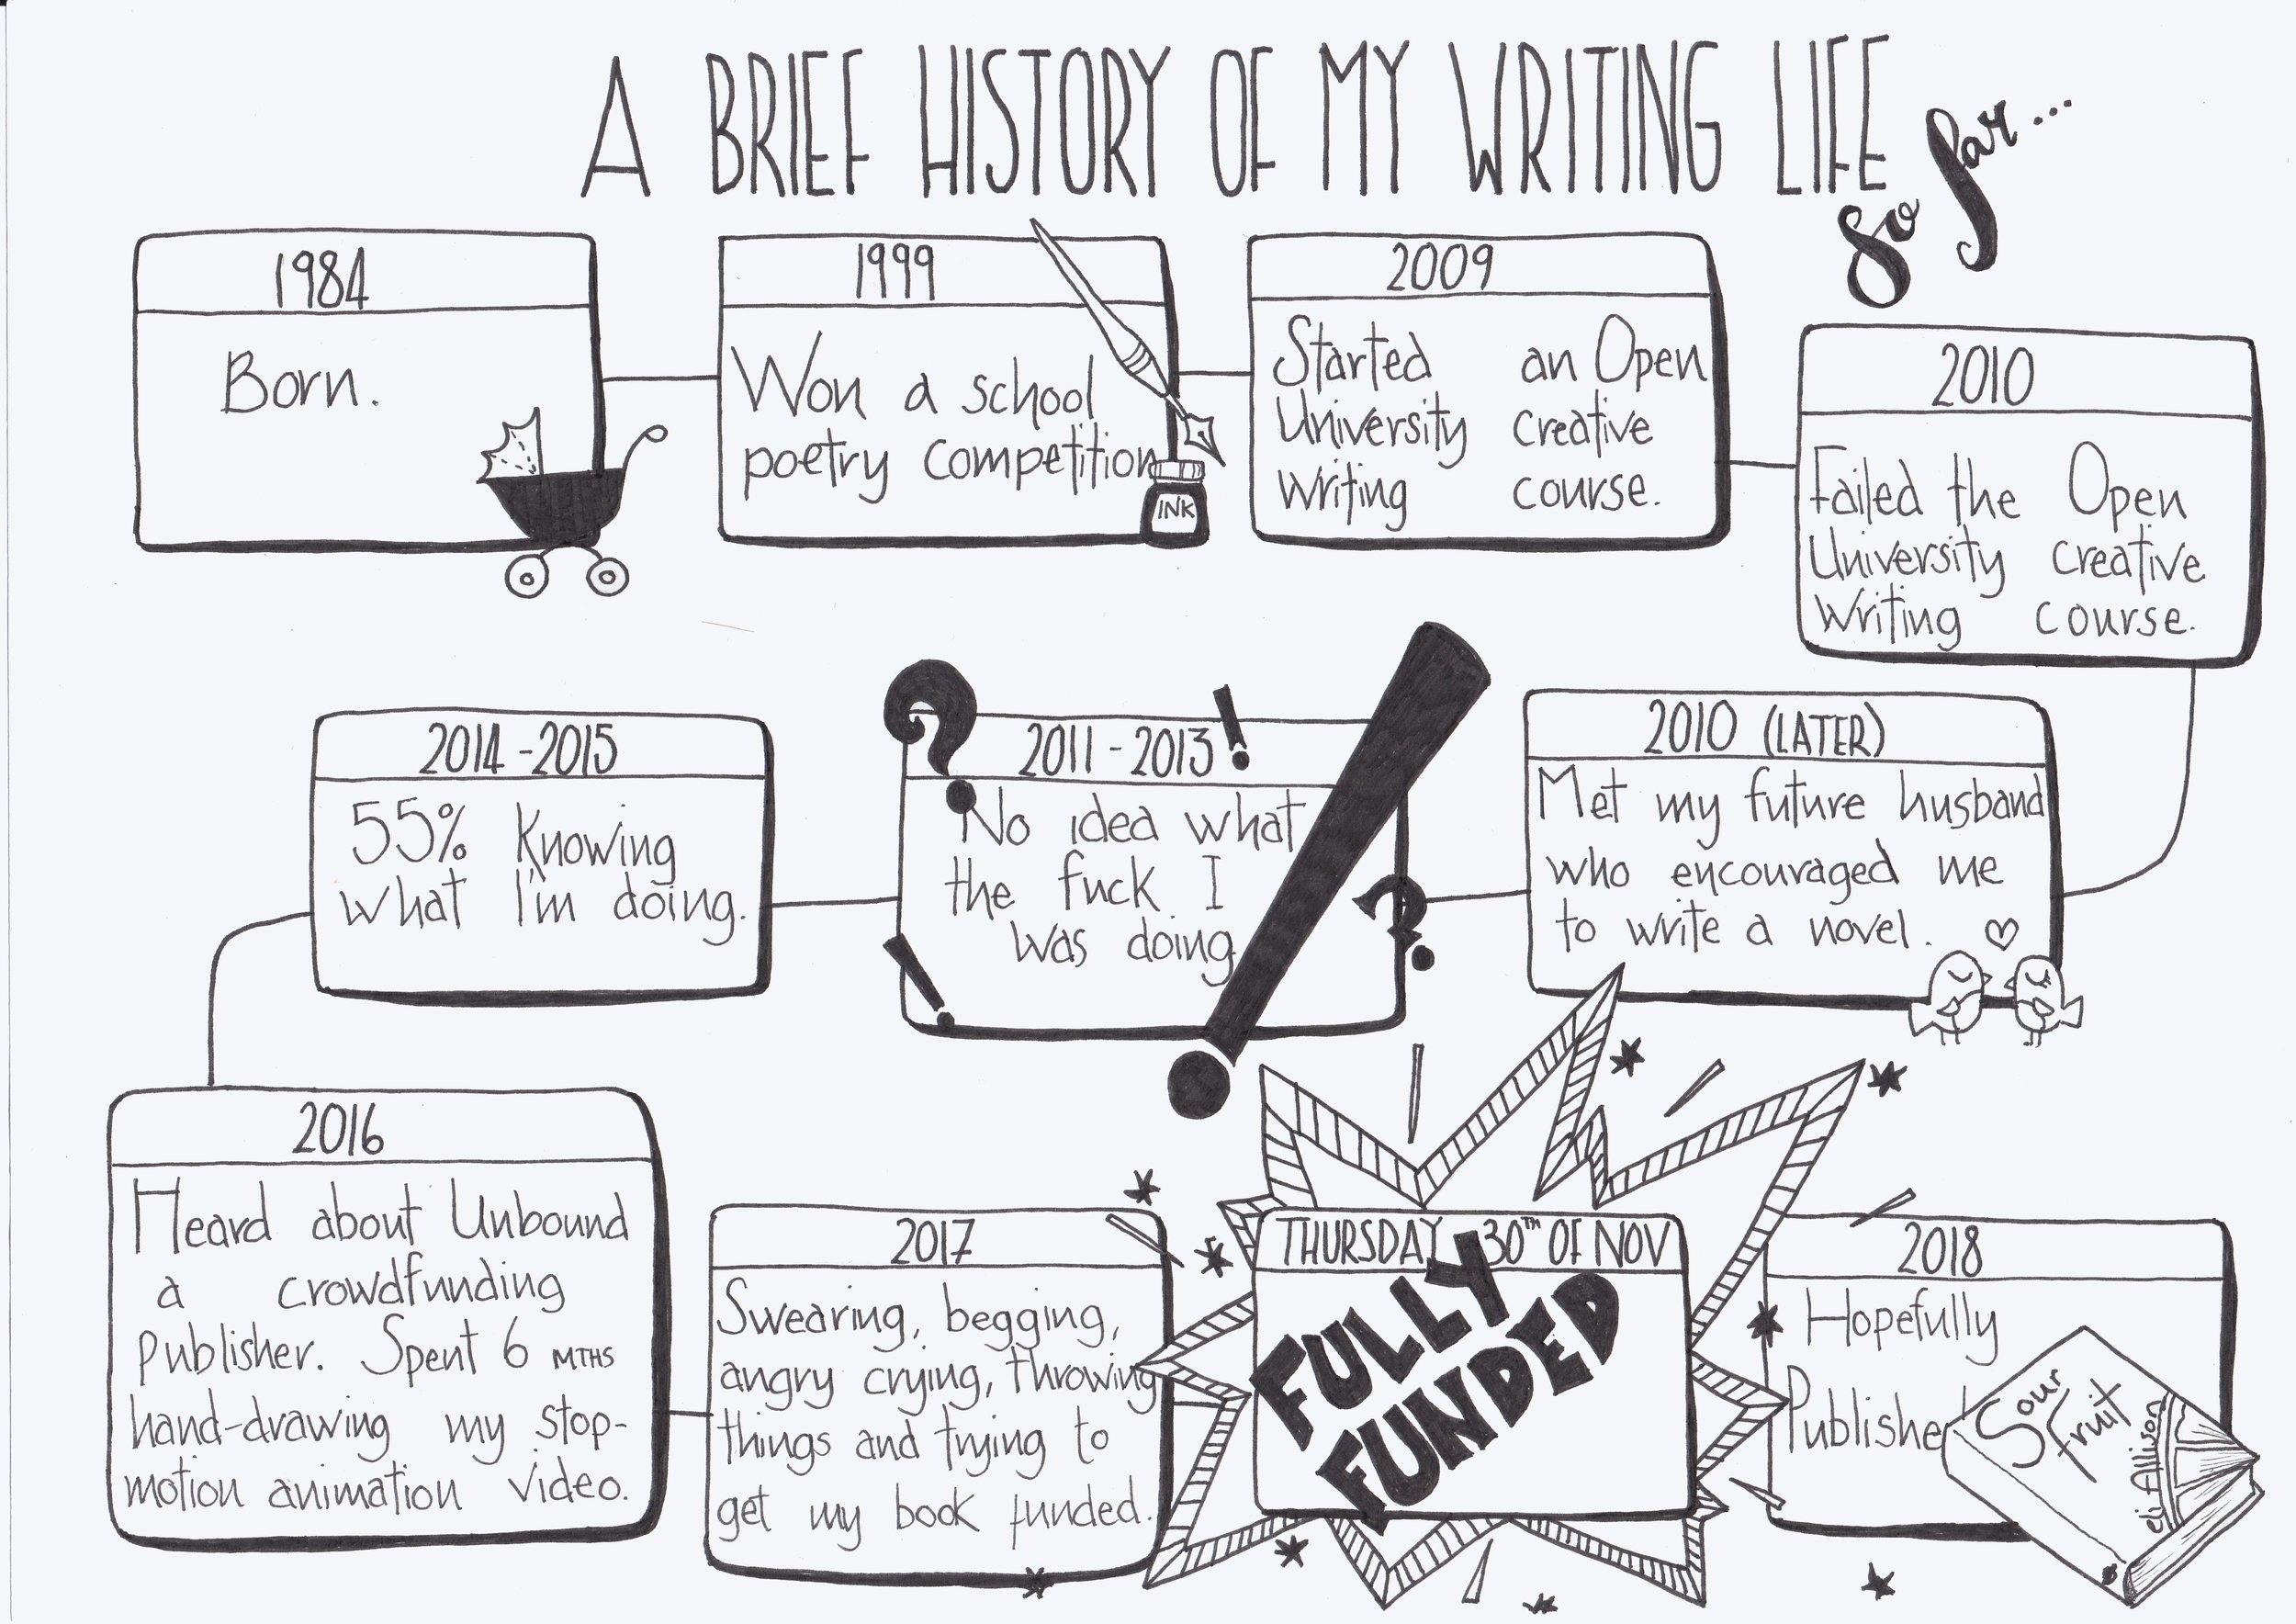 a brief history of my writing life drawing.jpg